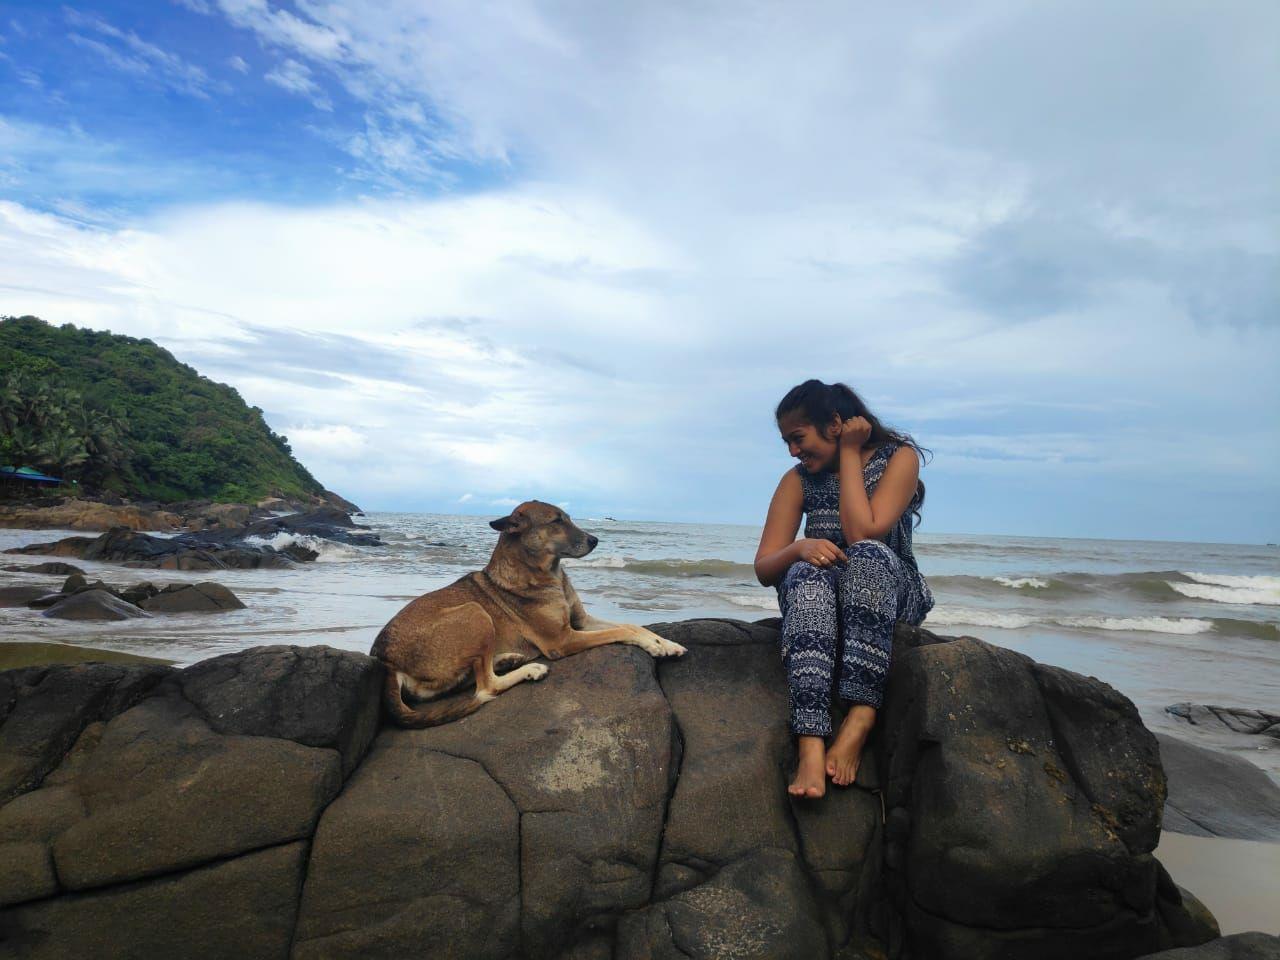 Photo of Kudle Beach By Bhumika Bhat